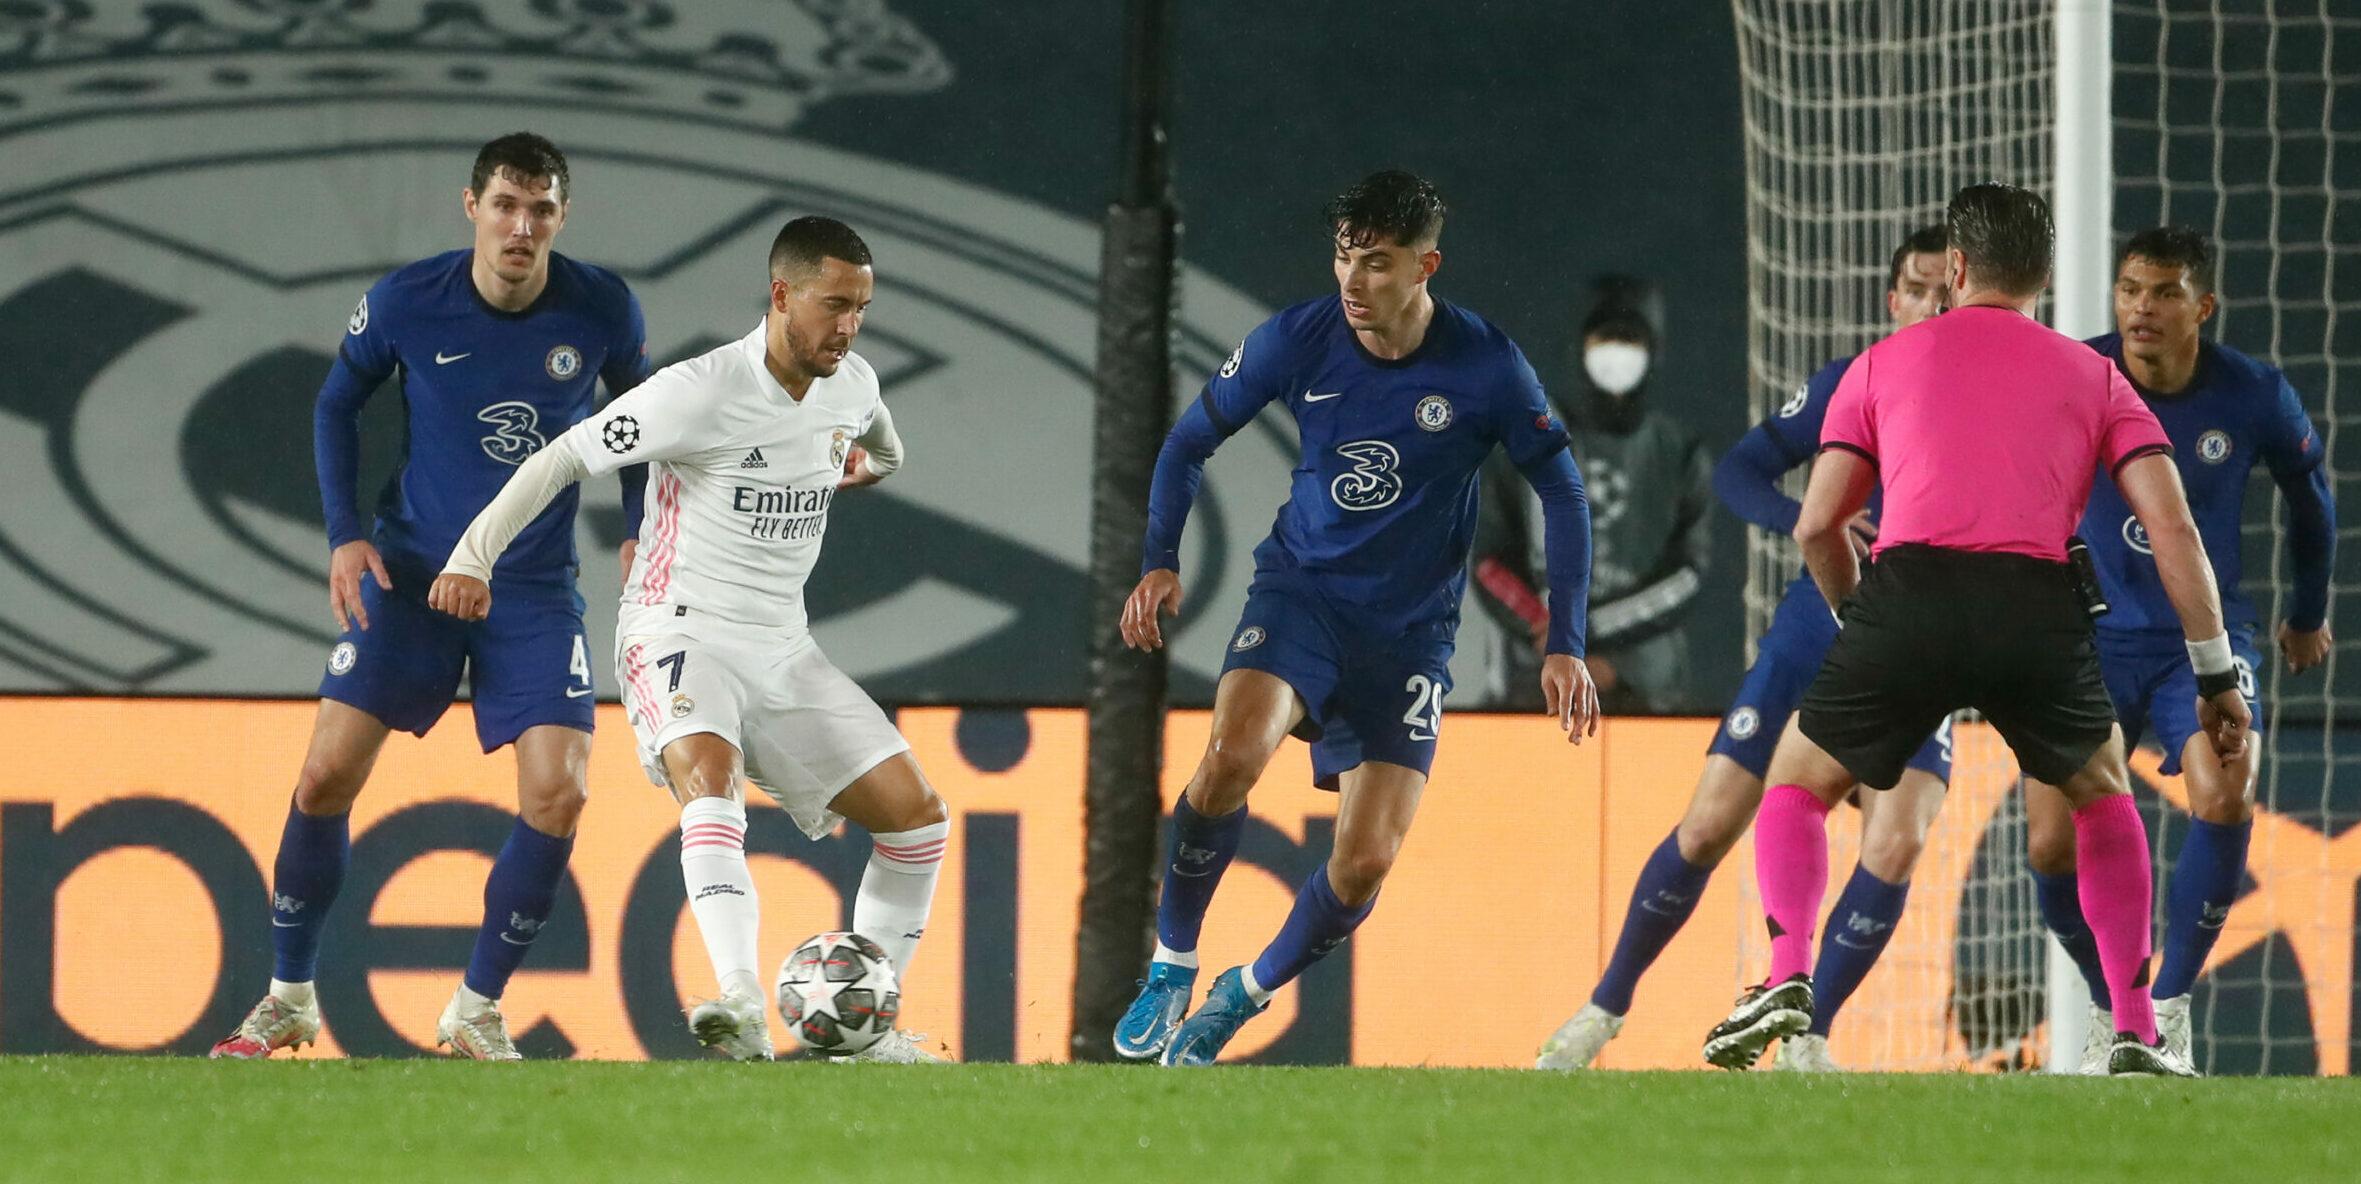 Imatge del partit entre Madrid i Chelsea | Europa Press